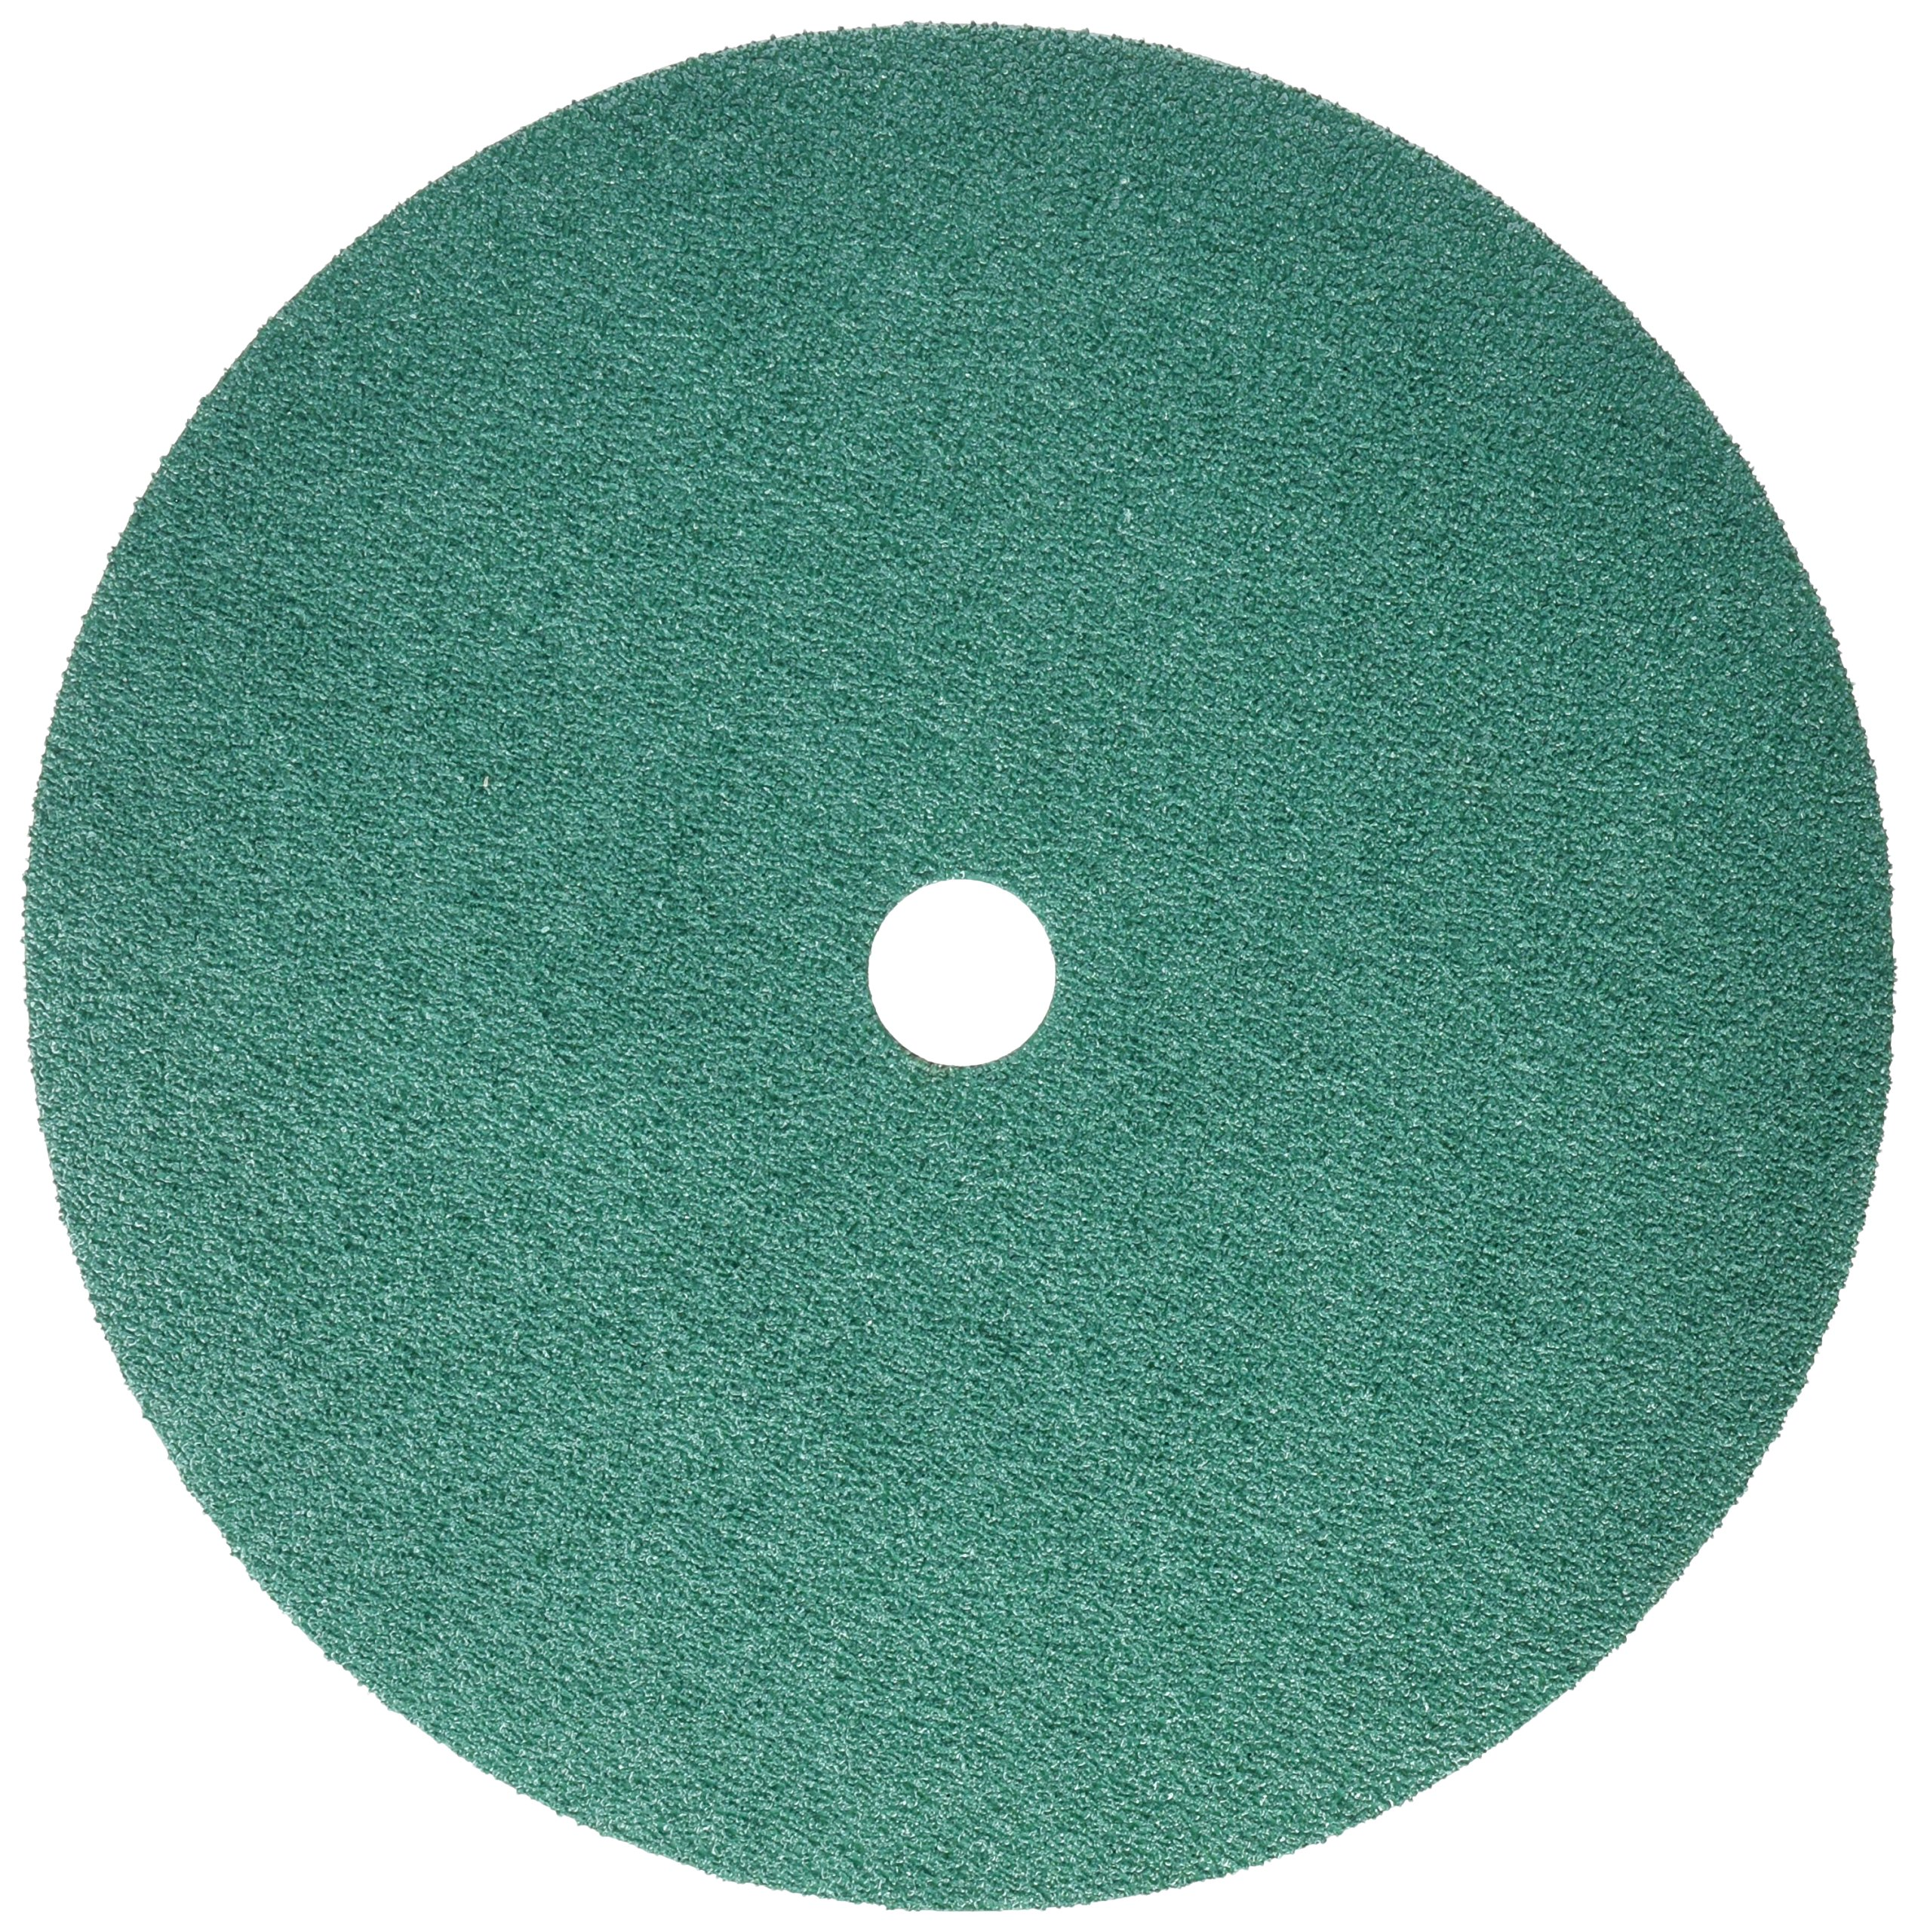 3M 01928 Green Corps 9-1/8'' x 7/8'' 36 Grit Fiber Disc